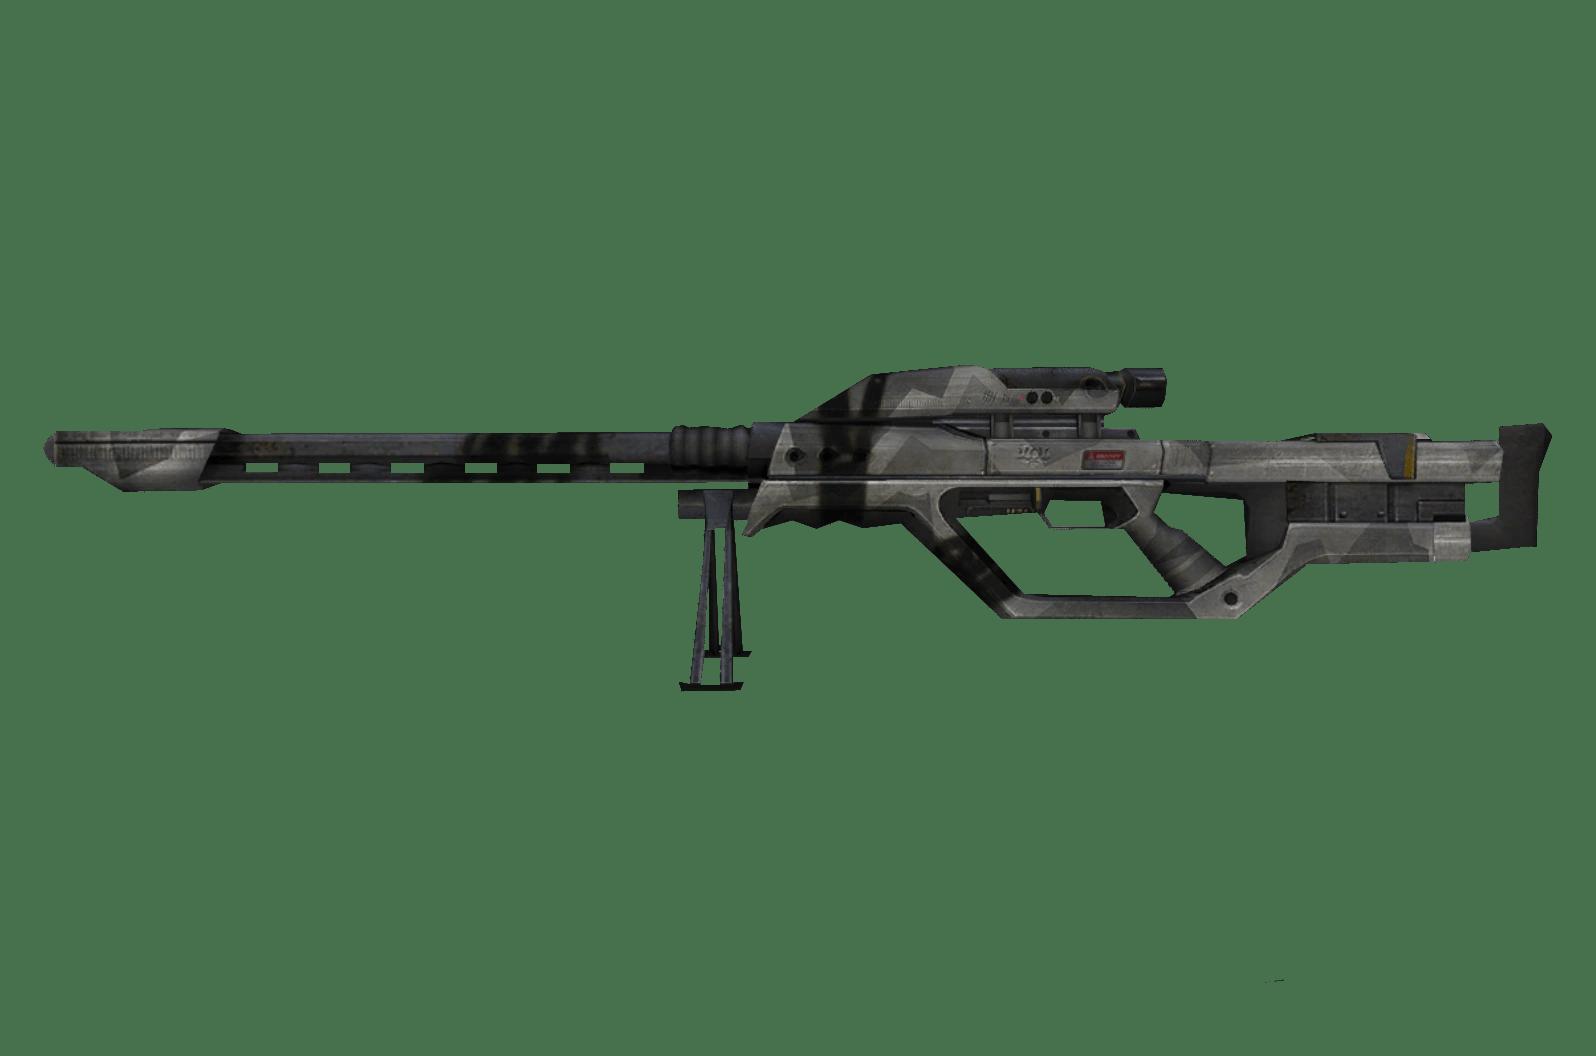 Halo Airsoft Guns